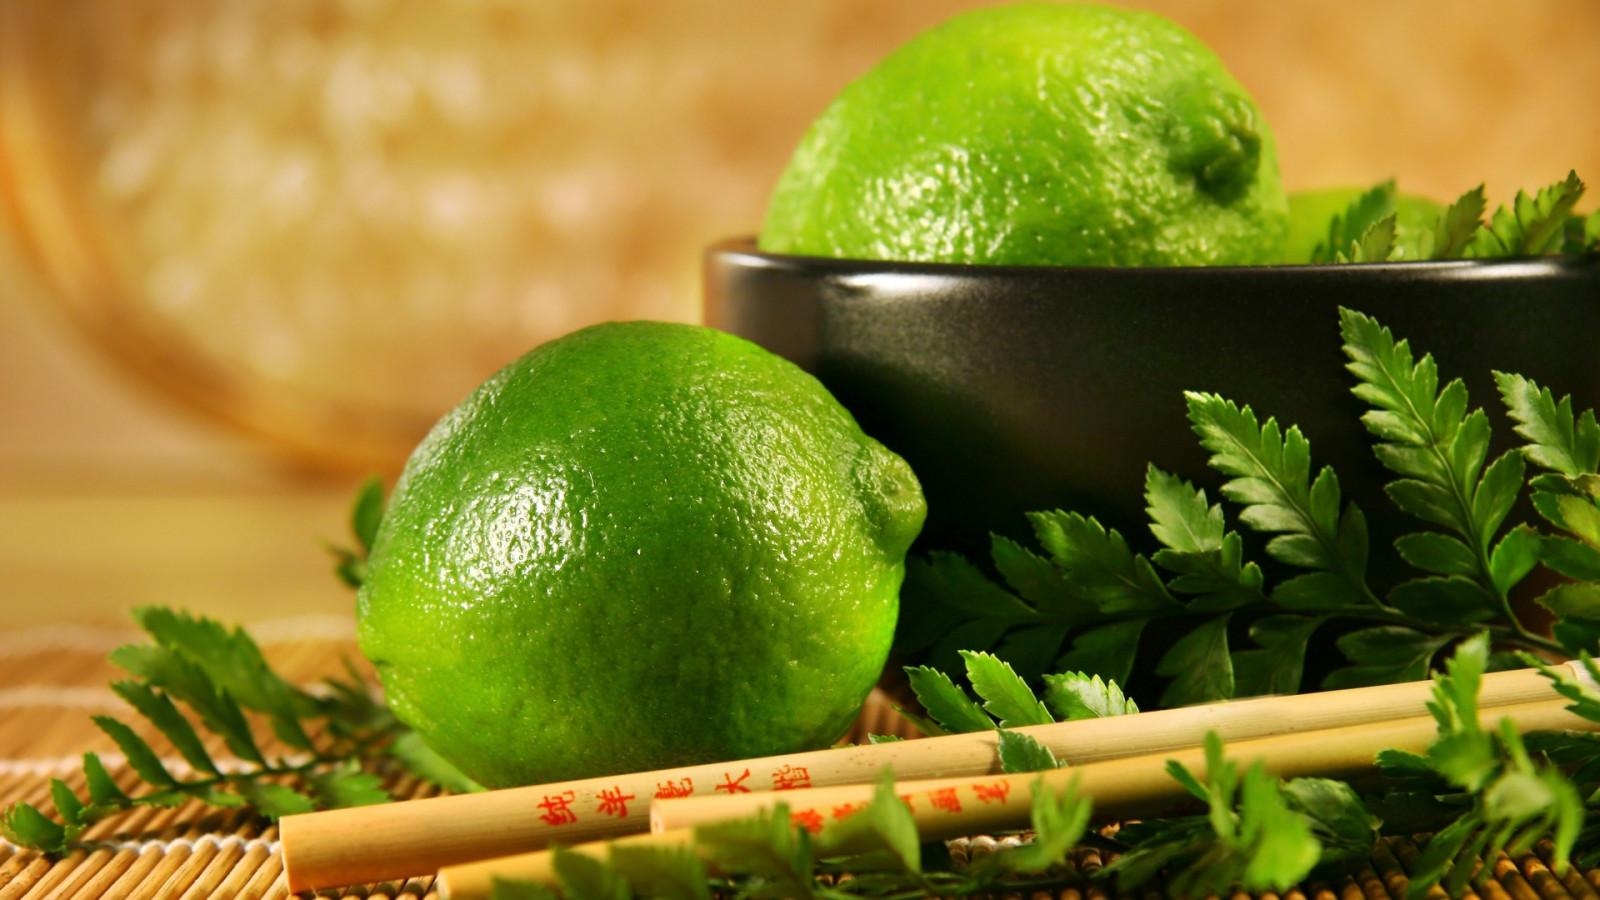 food, fruit, green, lime, limes, citrus, chopstick, plant, 1920x1080 px, produce, land plant, flowering plant, key lime